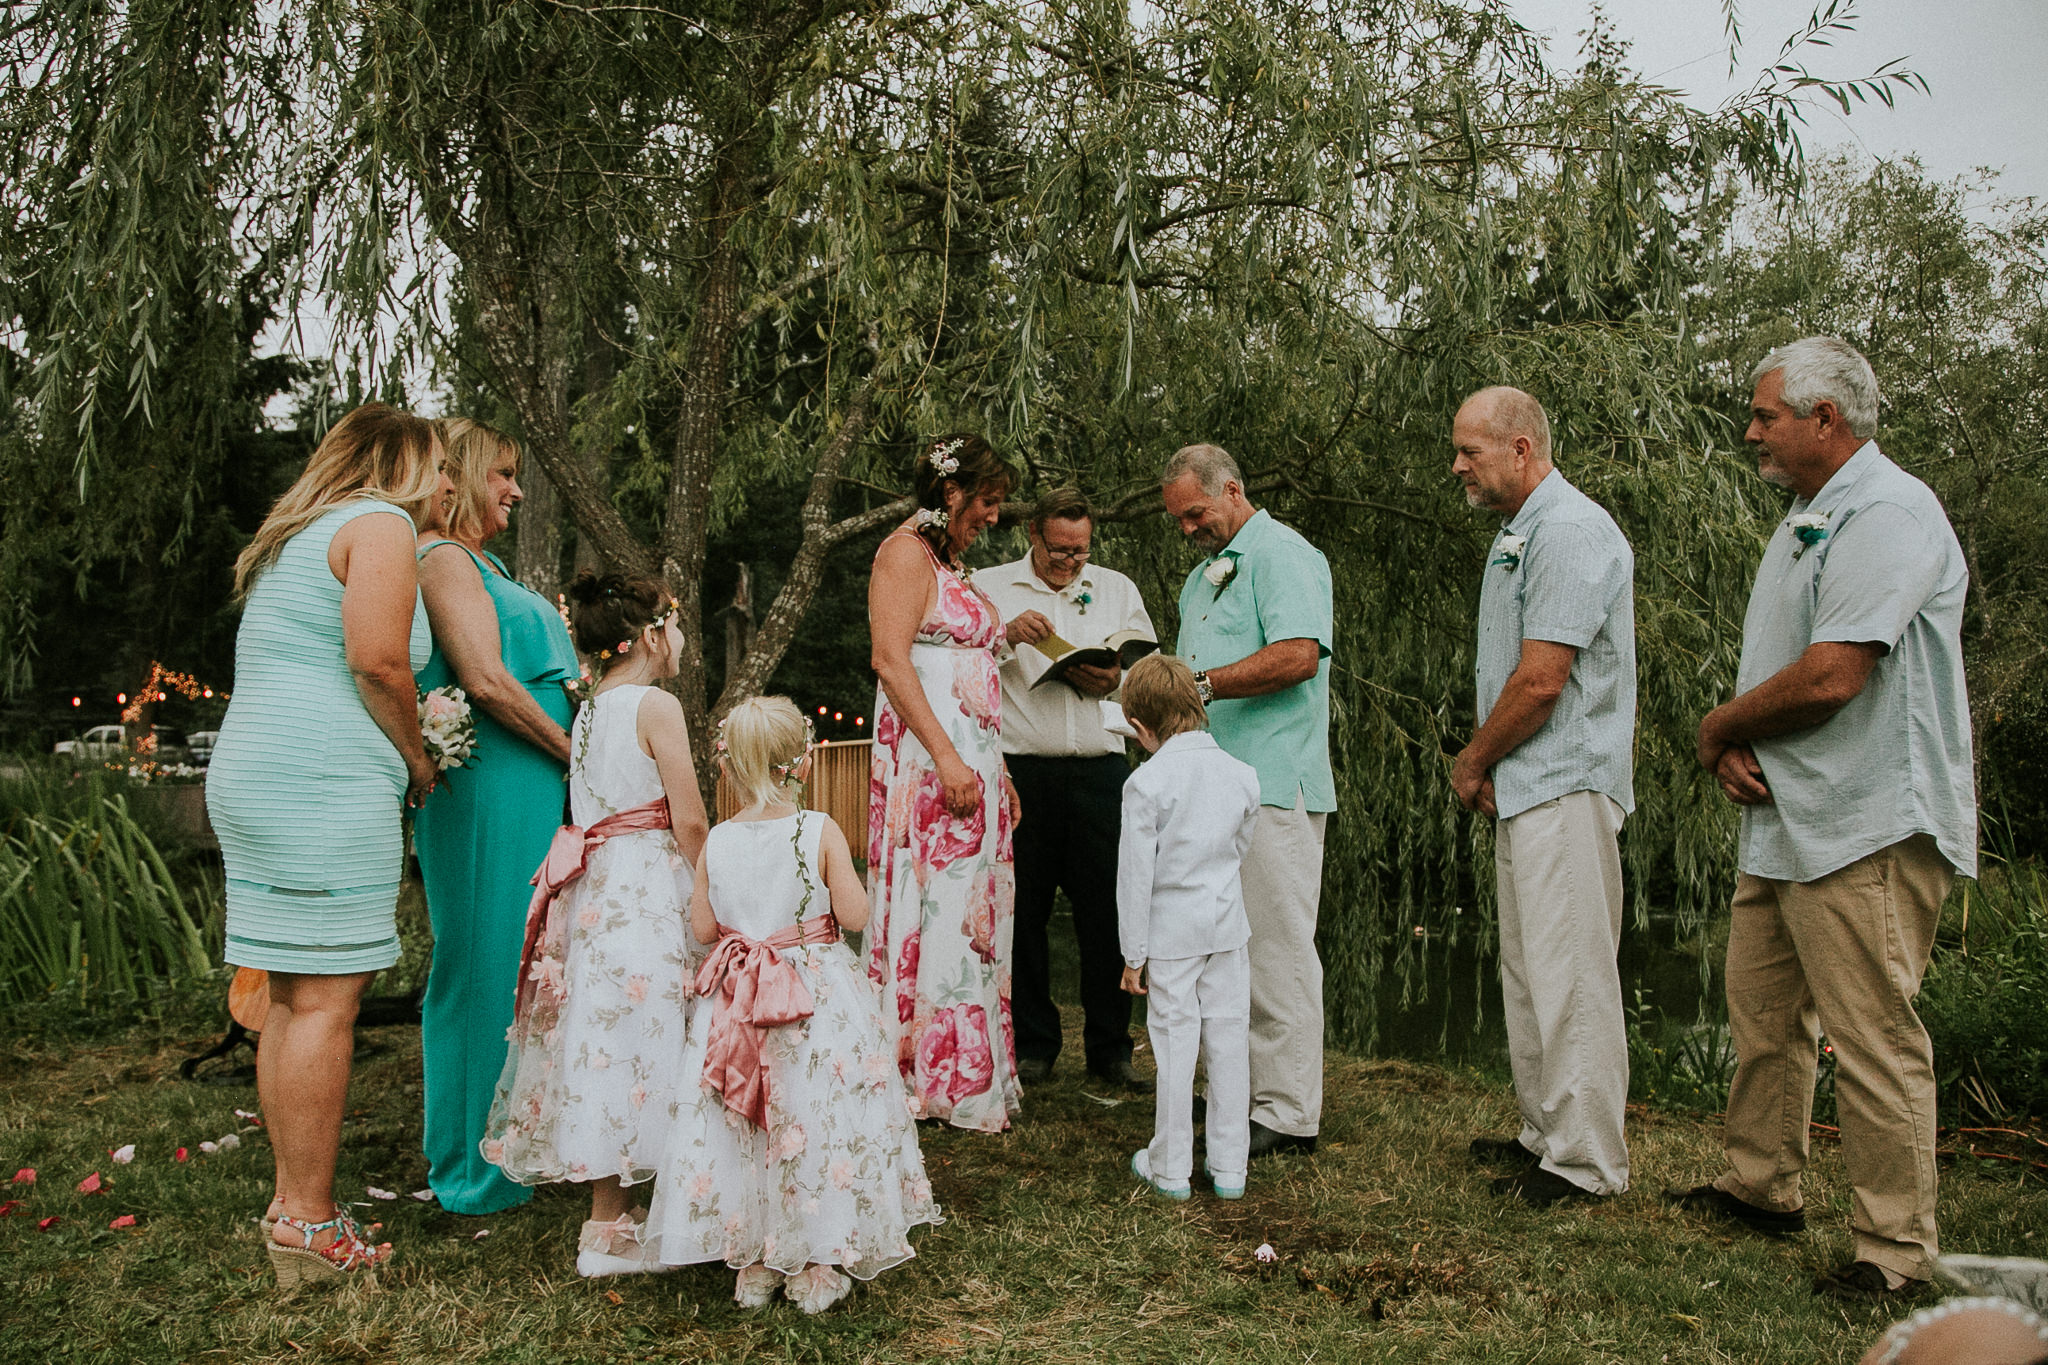 Backyard-Elopement-Ceremony-87.jpg